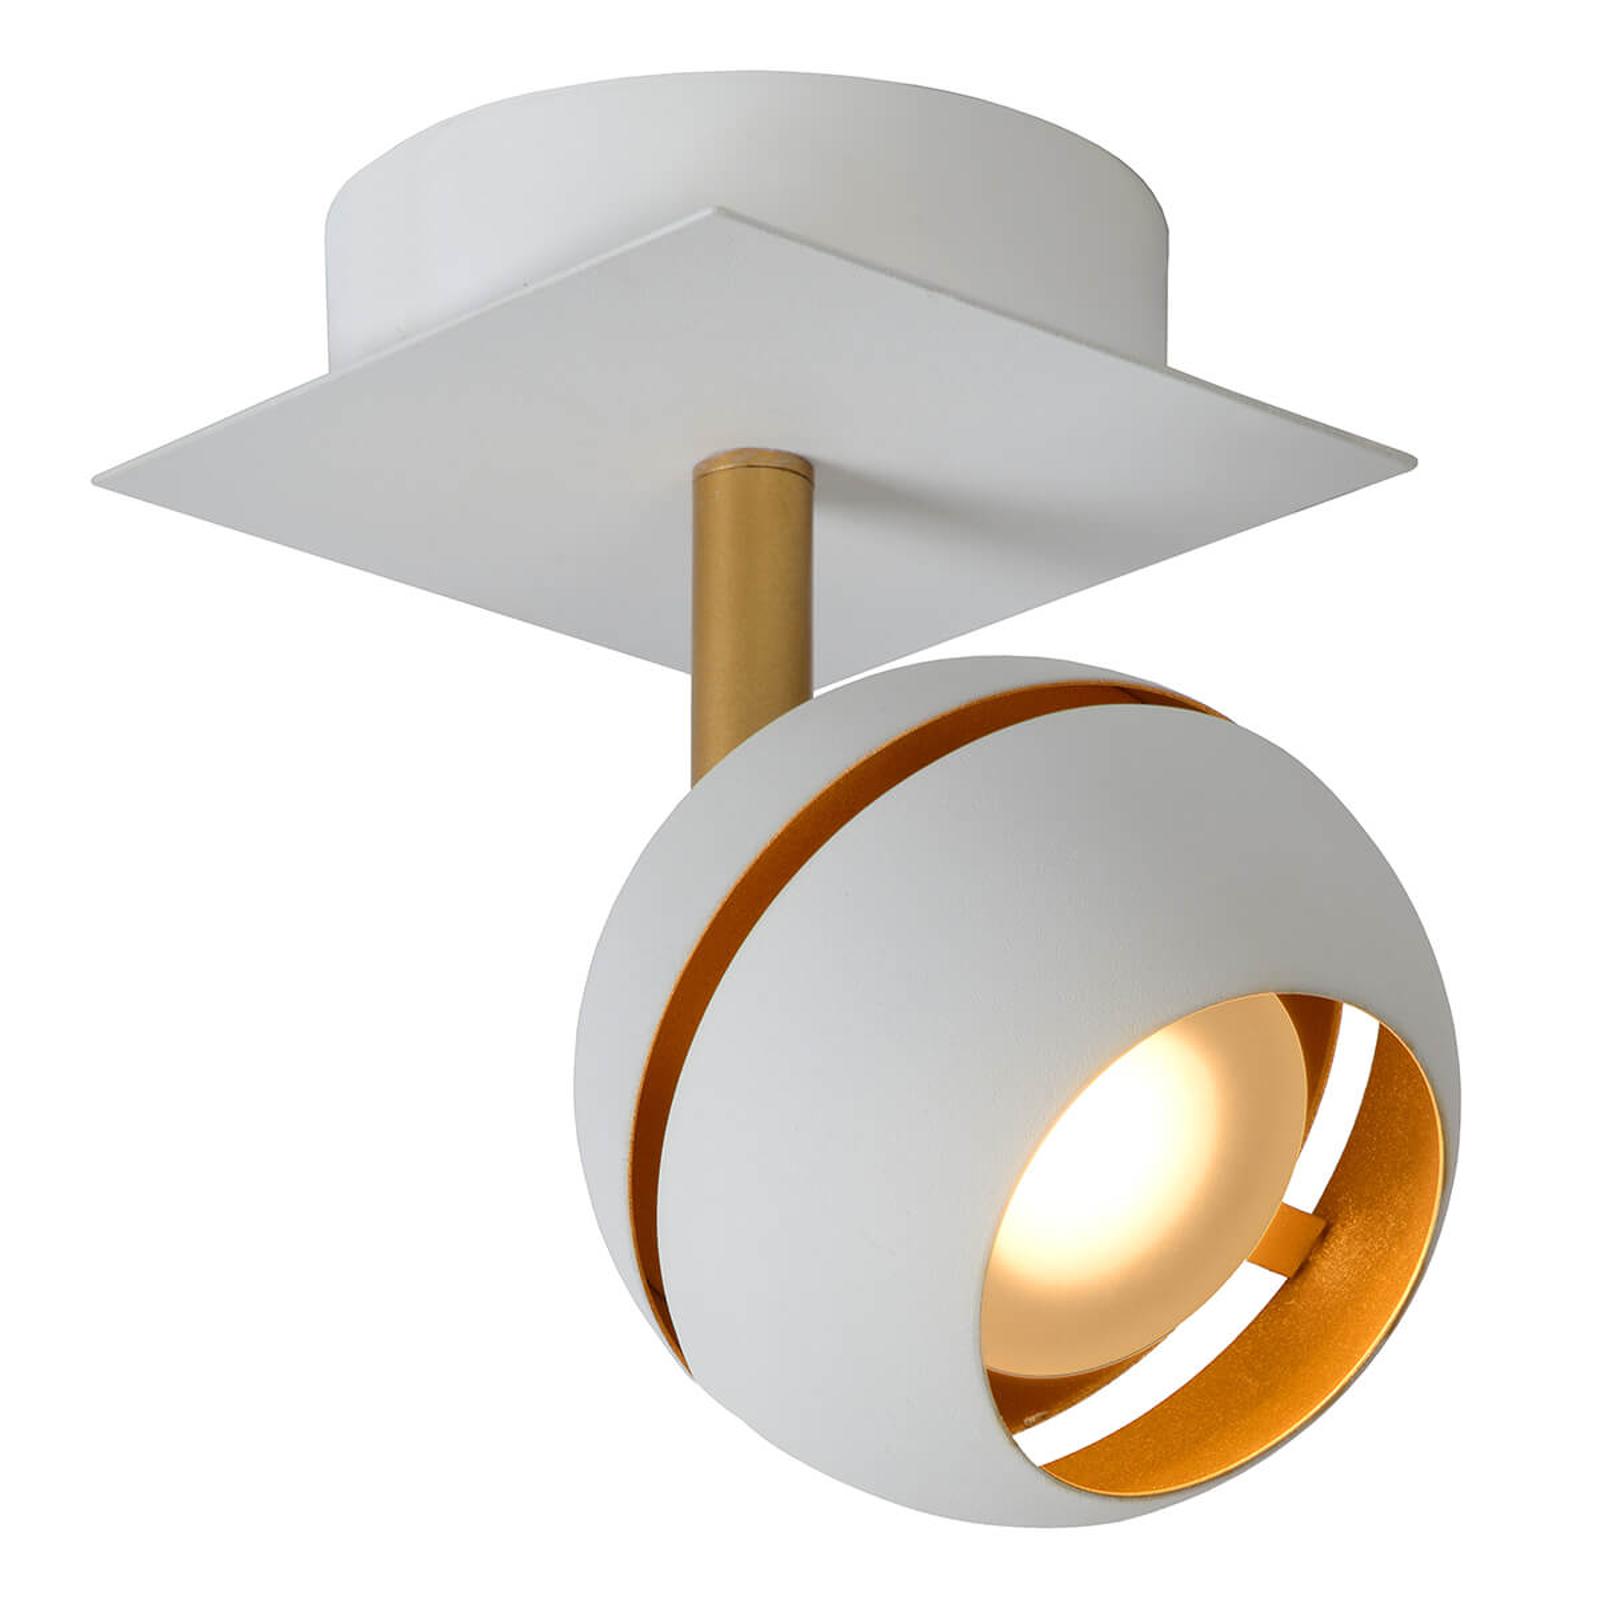 LED-Deckenstrahler Binari in Kugelform, weiß